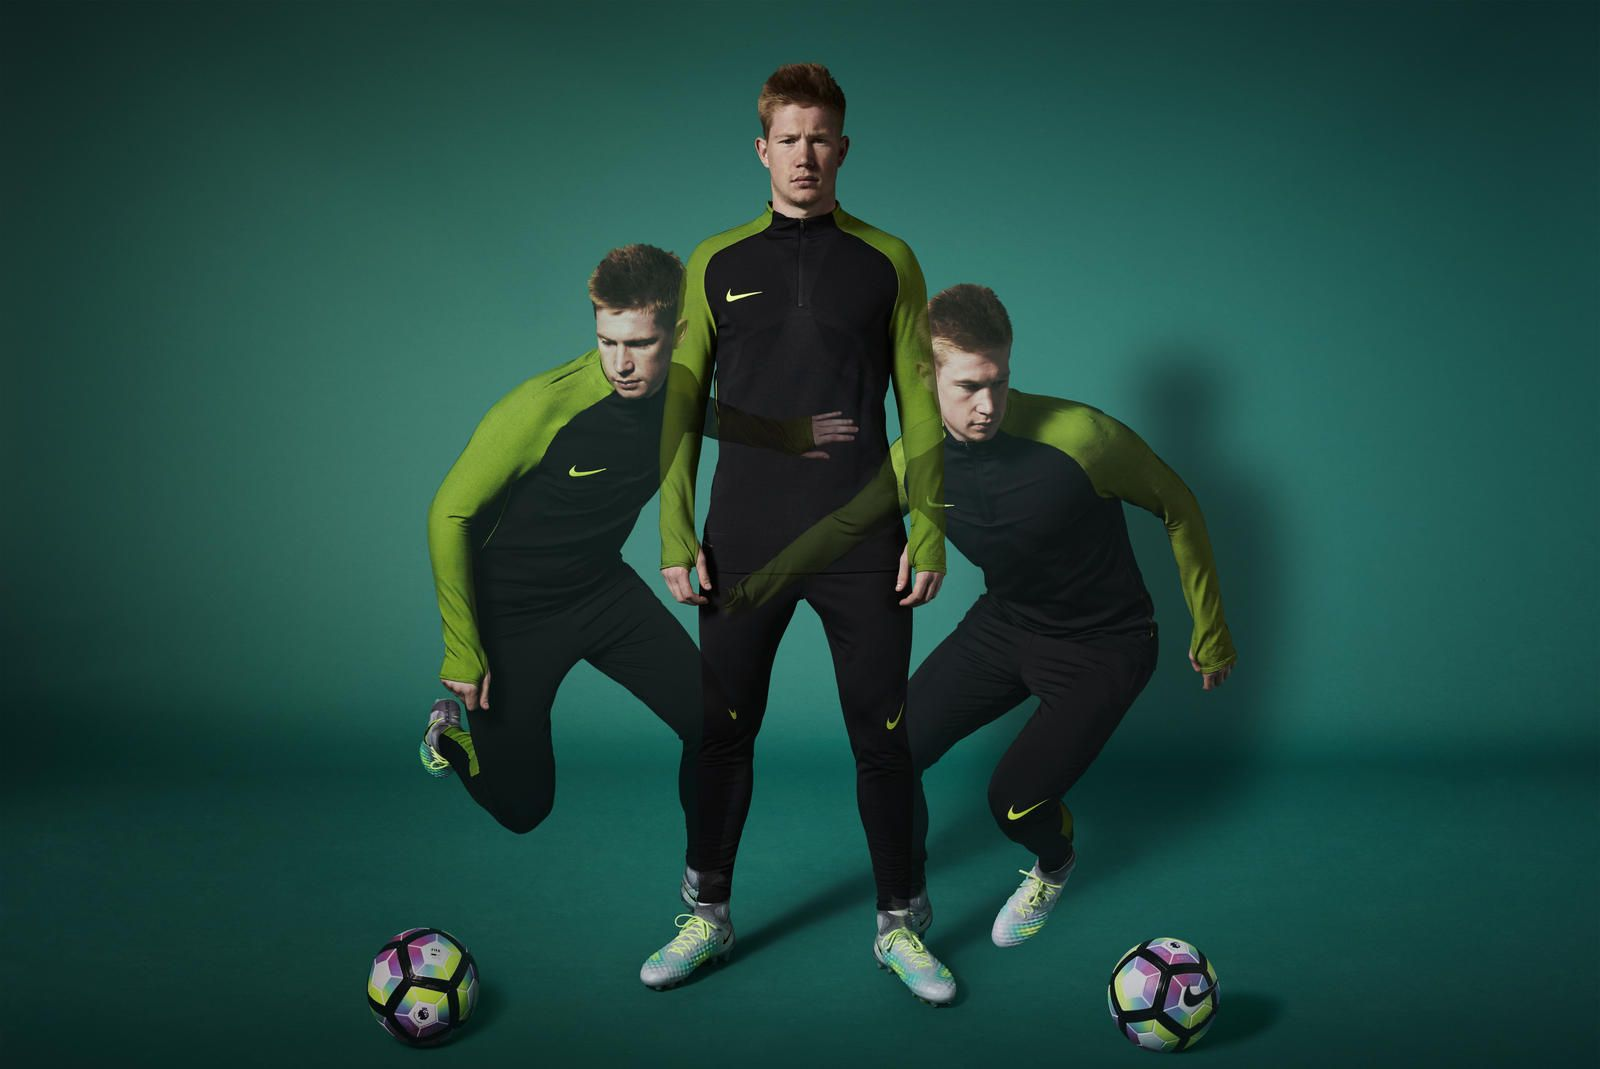 Kevin de bruyne, Soccer cleats nike